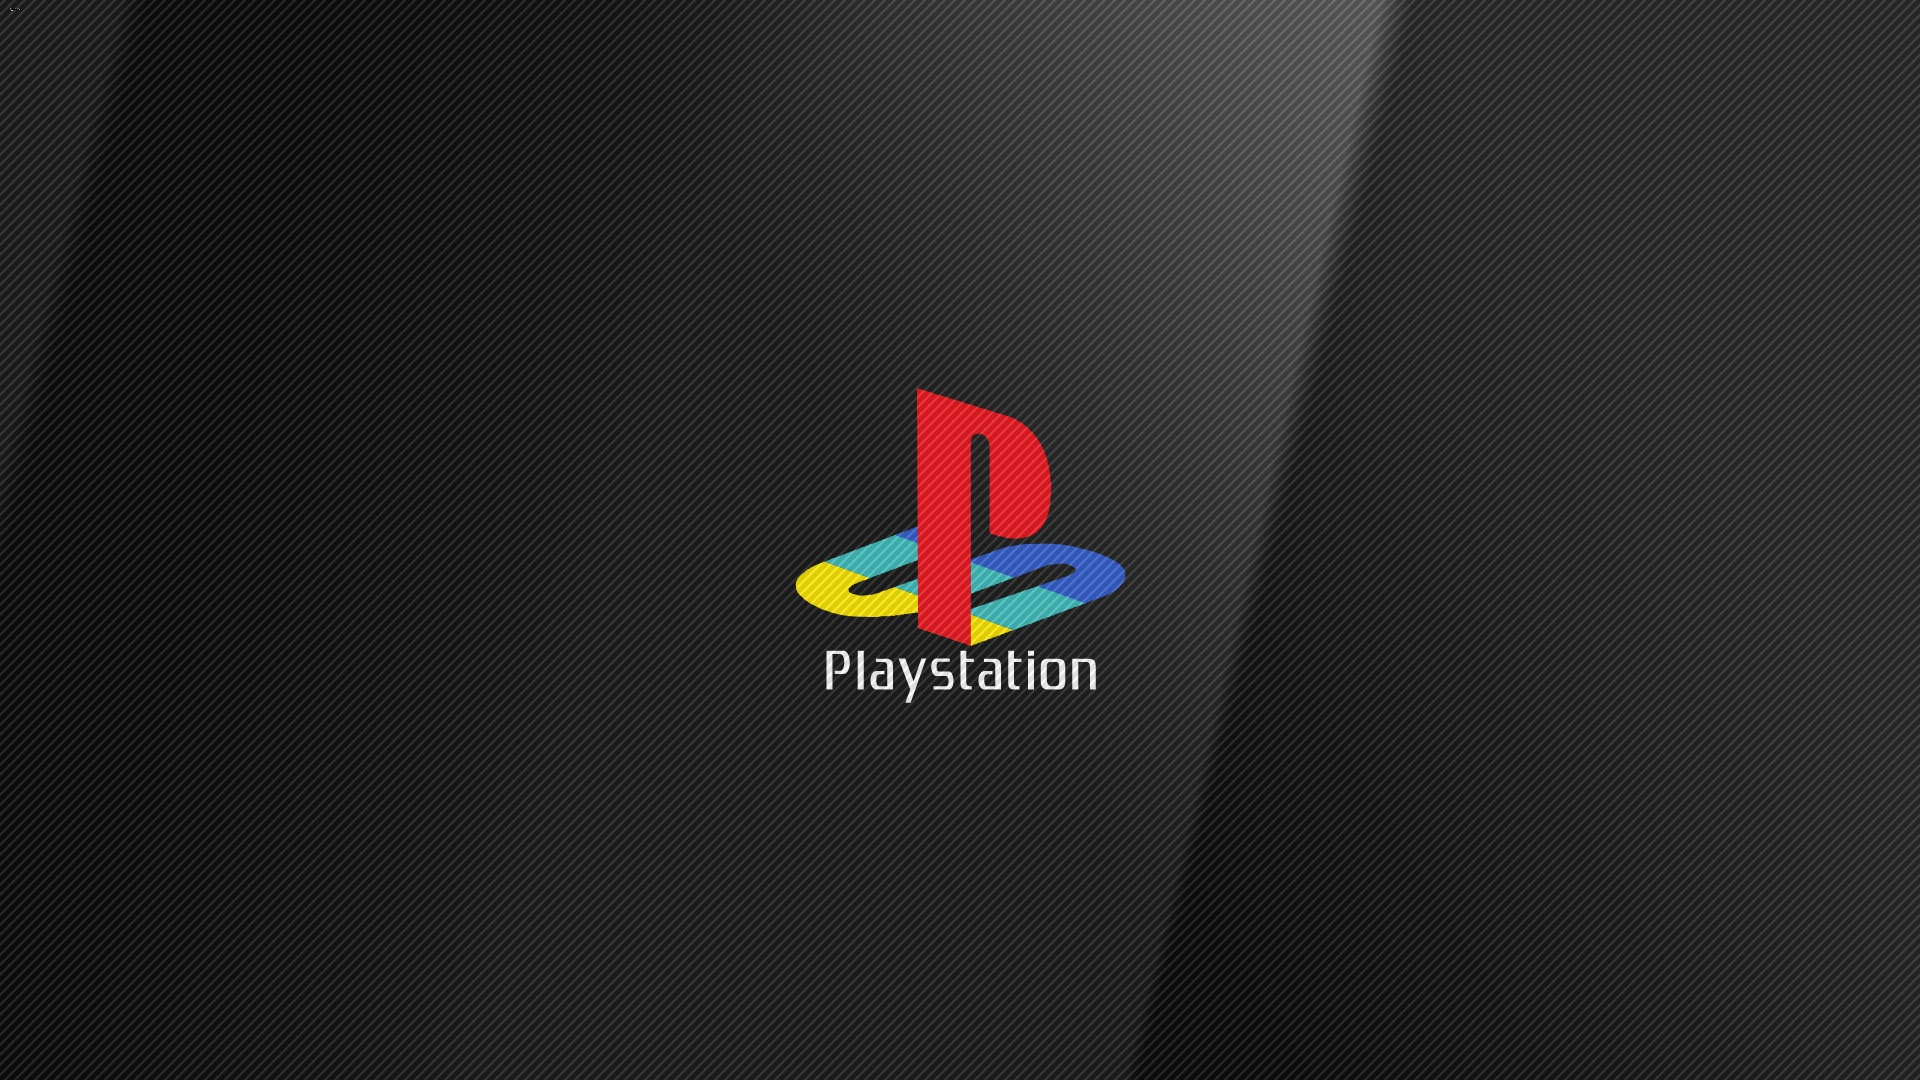 76 Playstation Wallpapers On Wallpapersafari